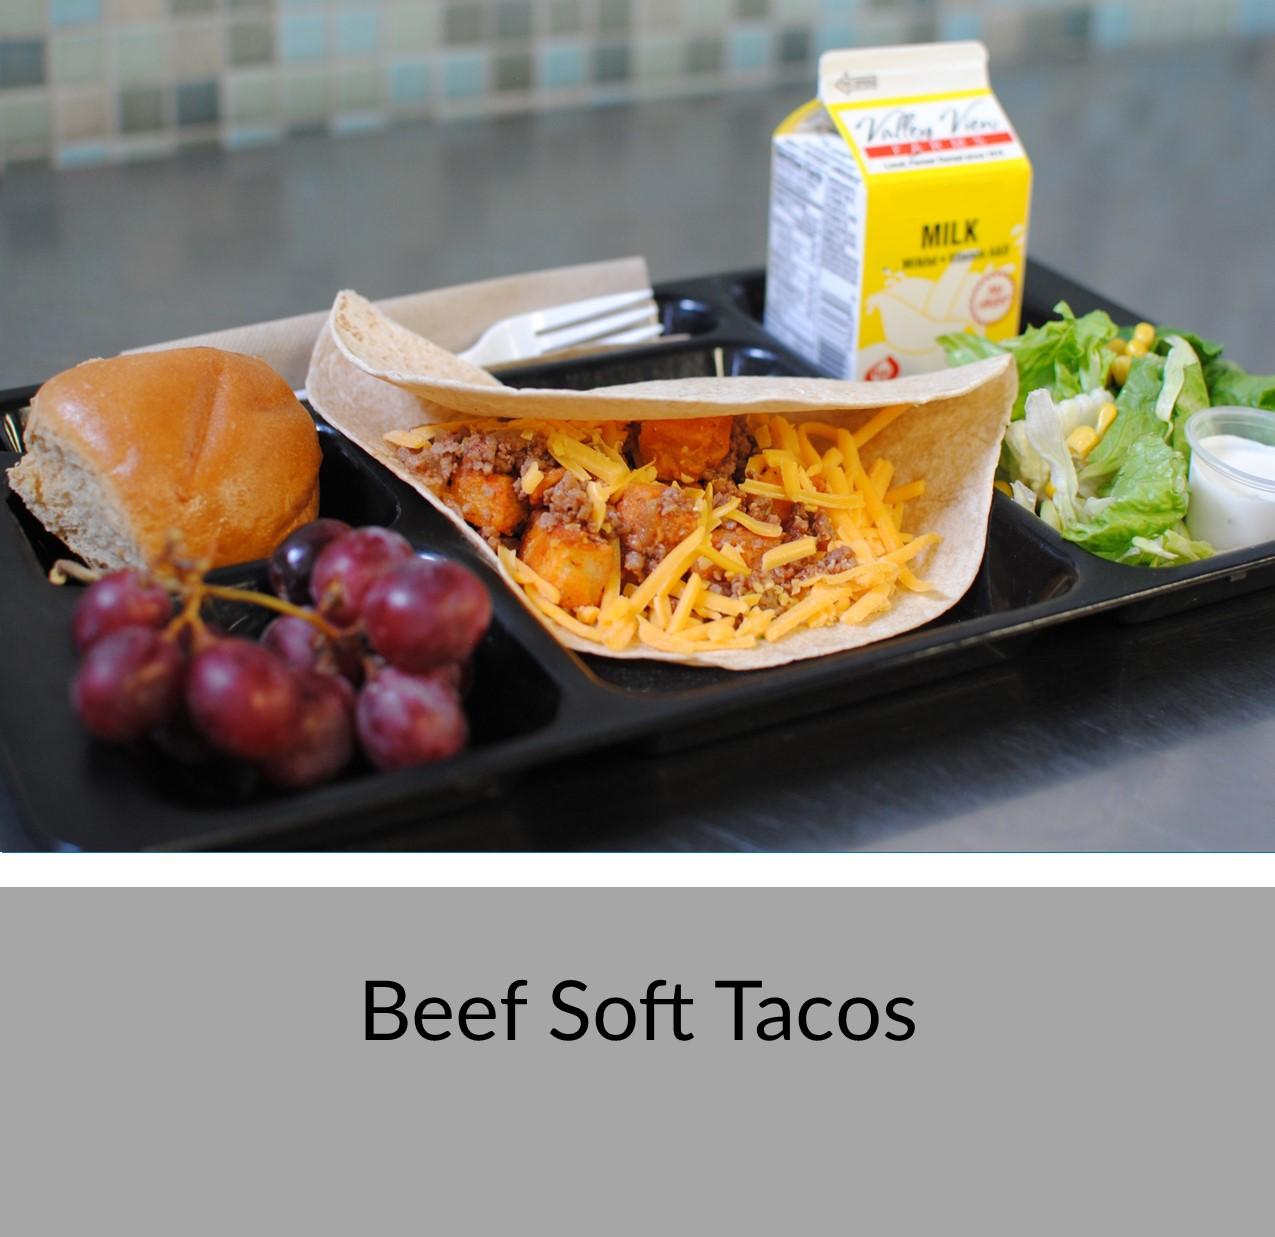 Beef Soft Tacos